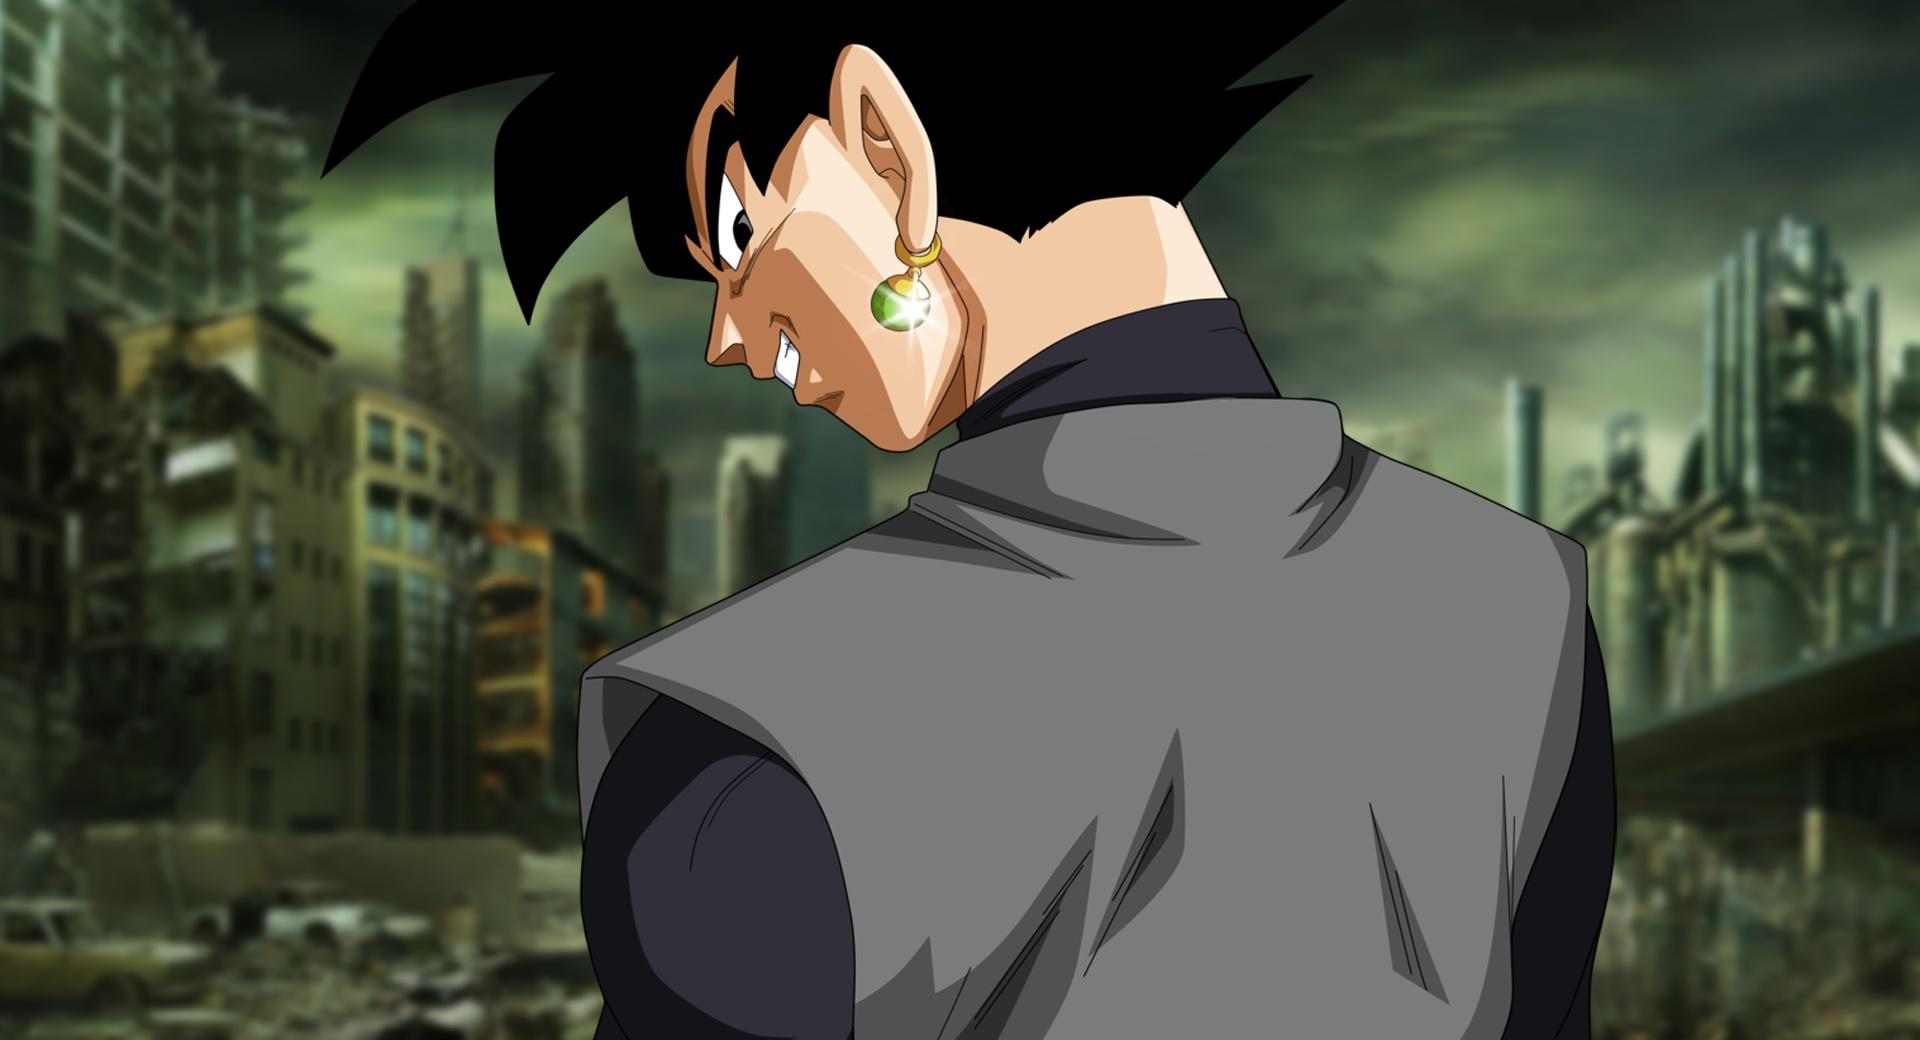 Black Goku wallpapers HD quality